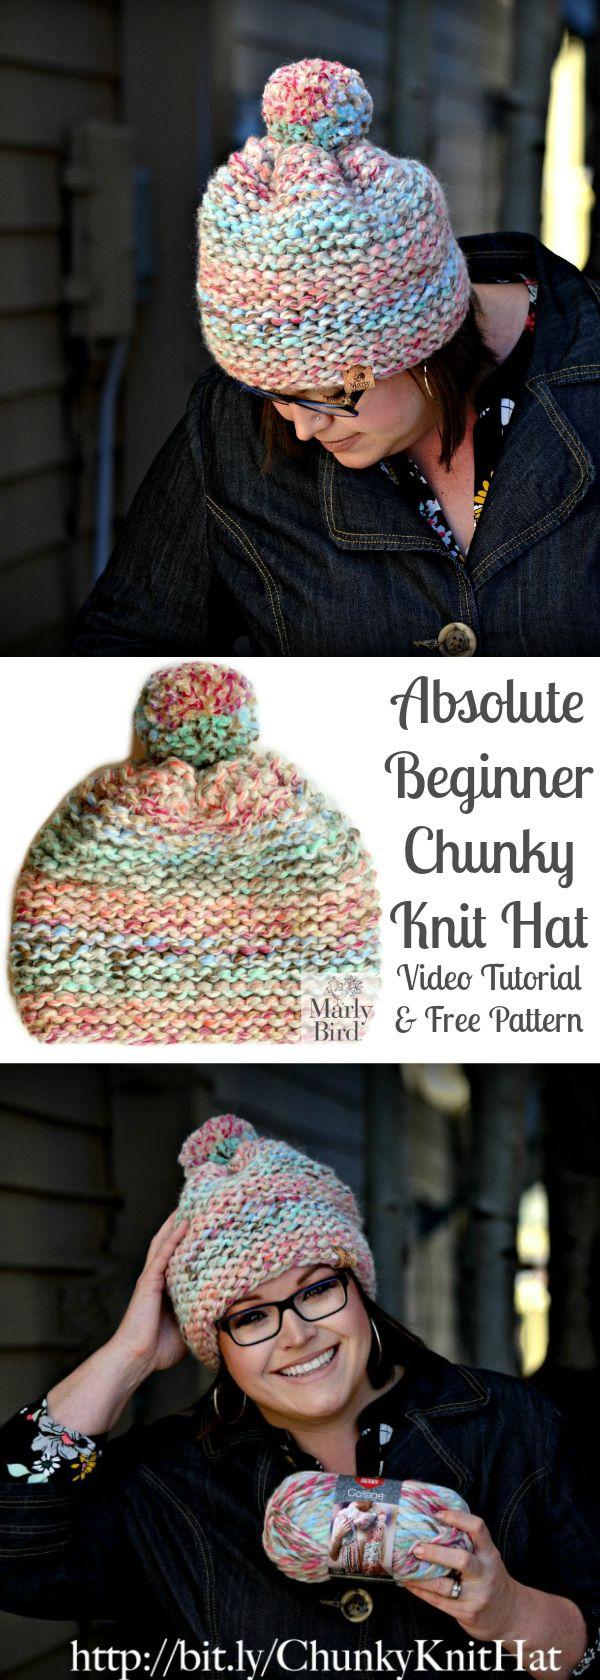 Absolute Beginner Chunky Knit Hat | { hand made } | Pinterest ...